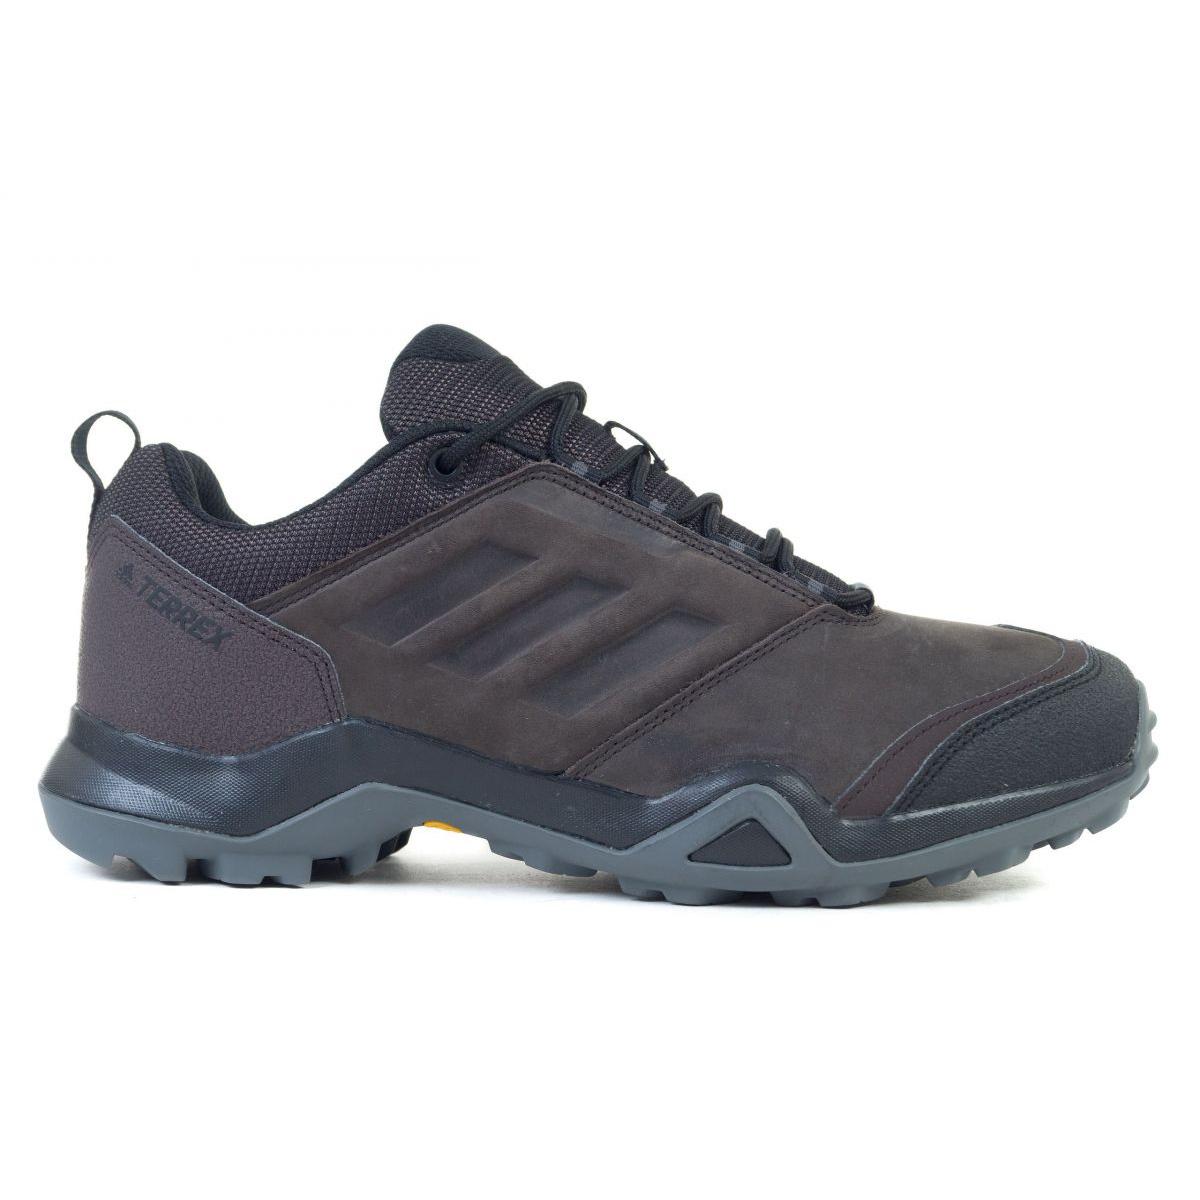 Adidas Terrex Brushwood Leather M AC7856 shoes brown black